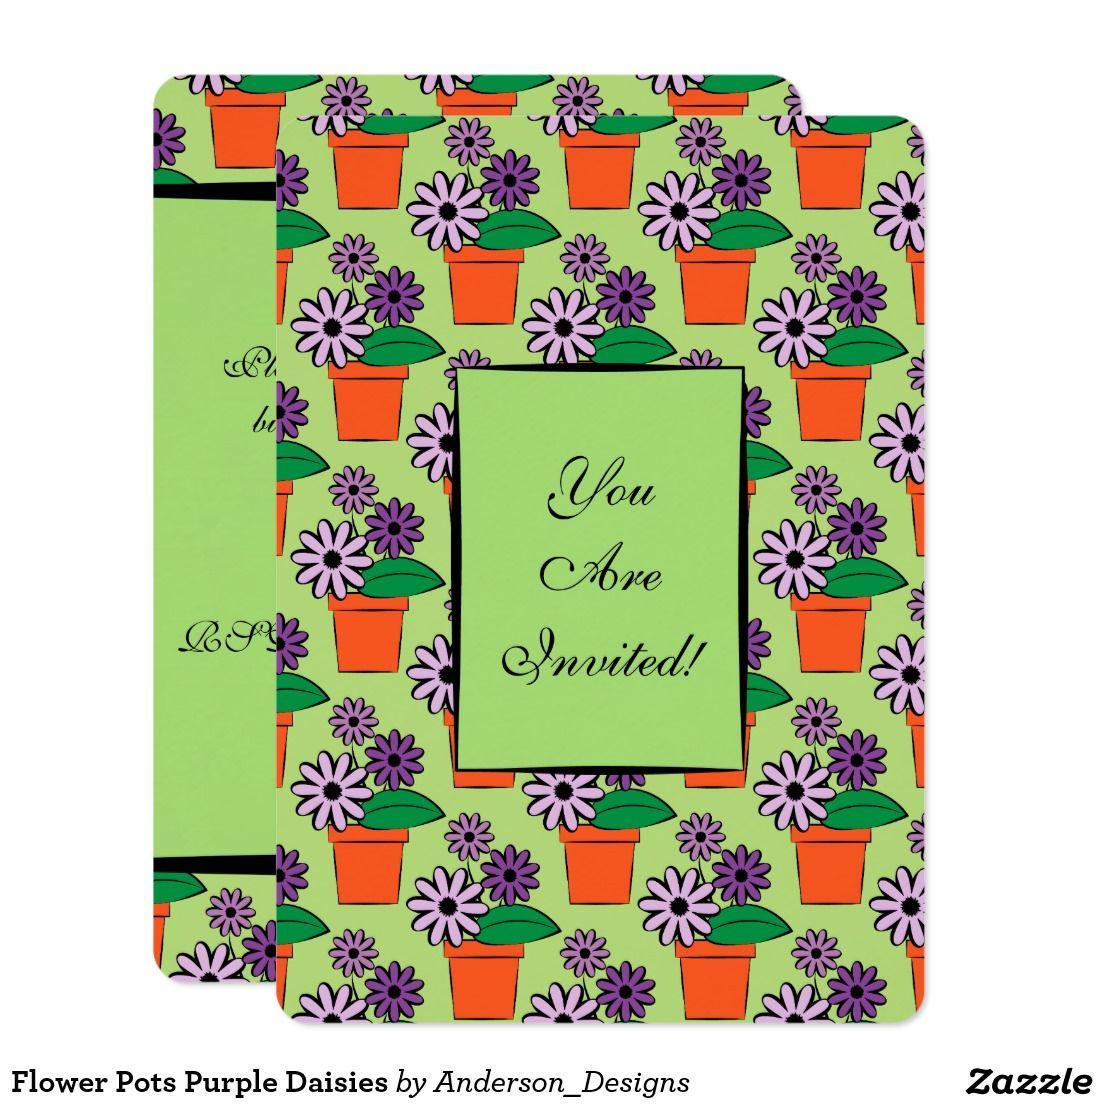 Flower Pots Purple Daisies Custom Invitations by @andersondesigns #Invitations